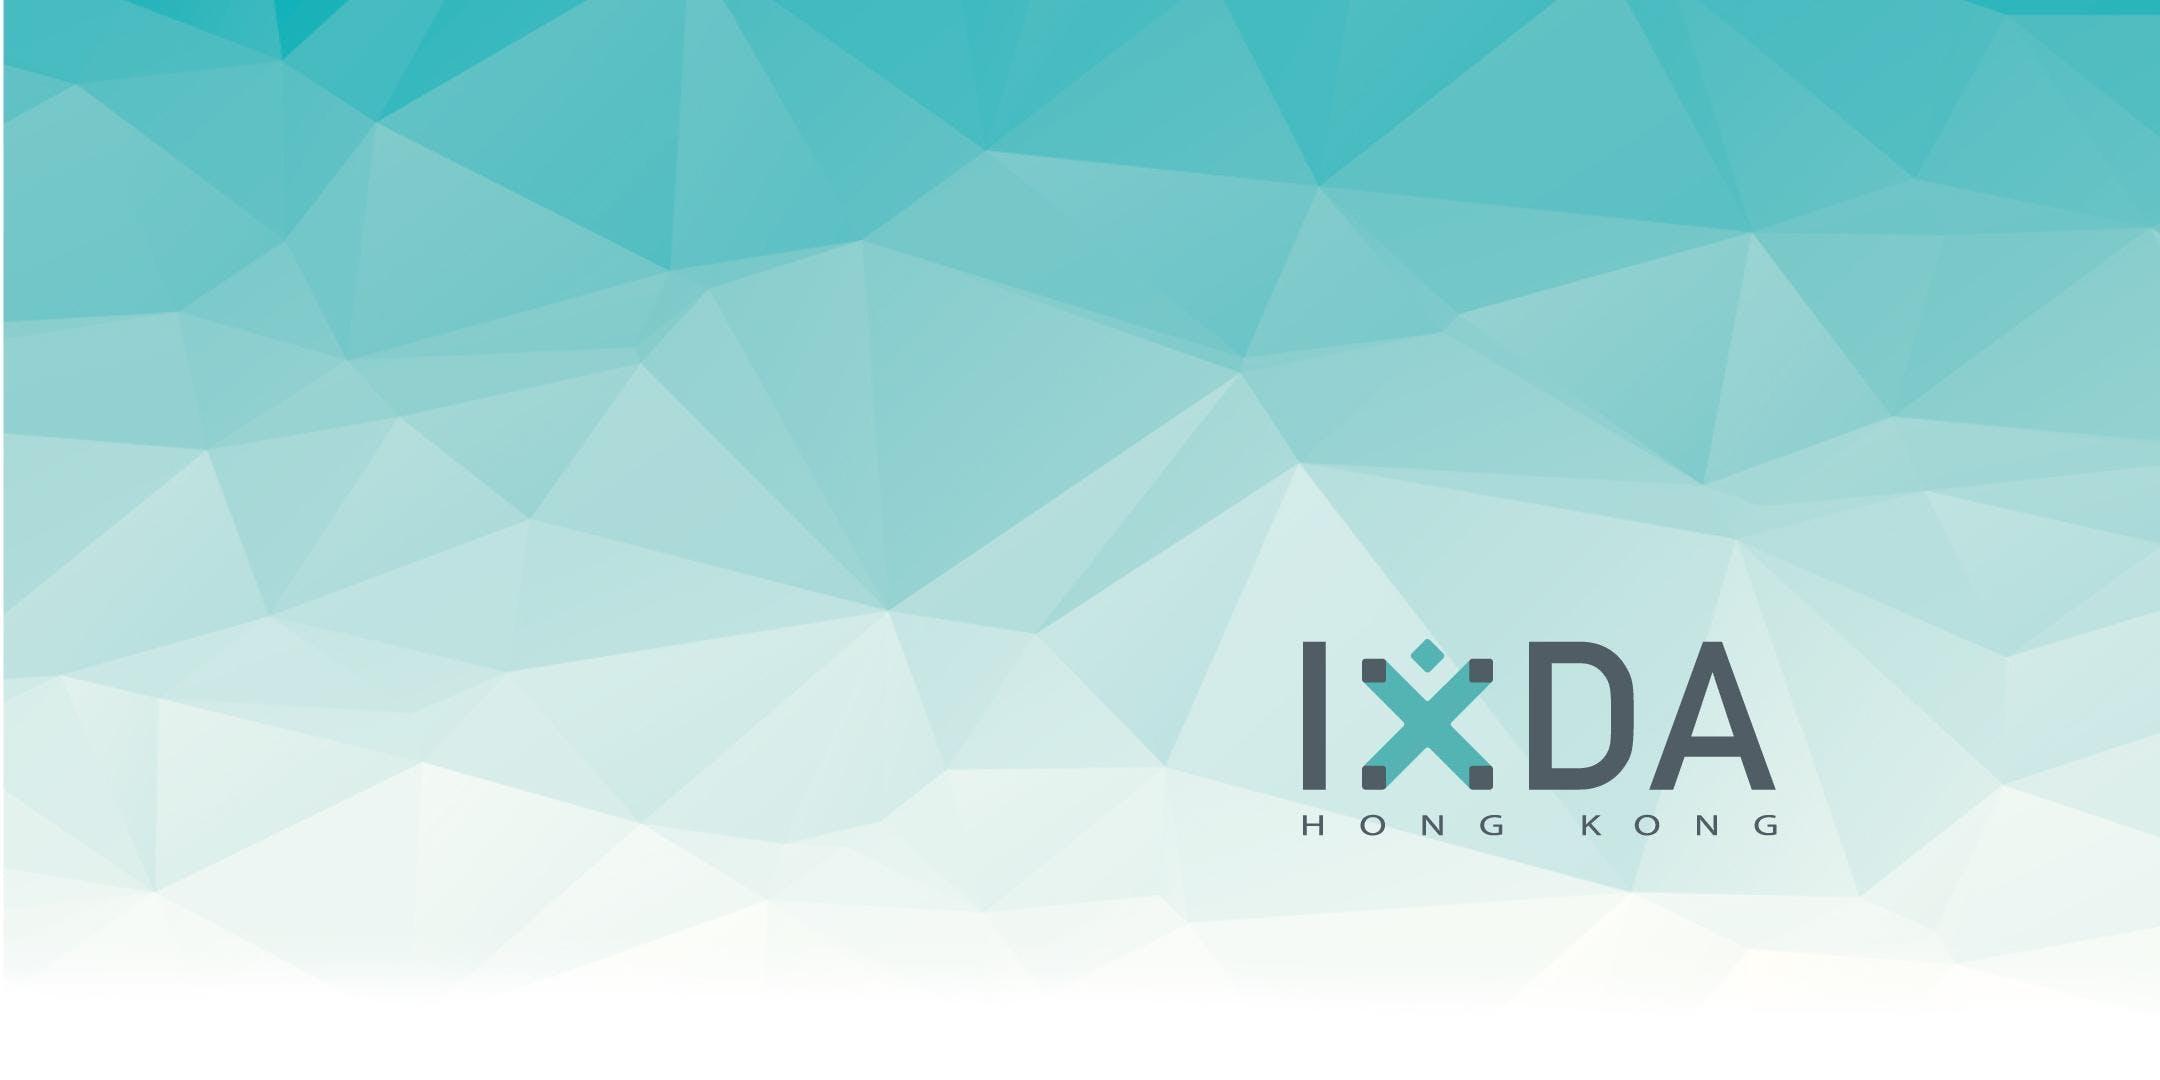 IxDAHK: Designing for China vs West Tech